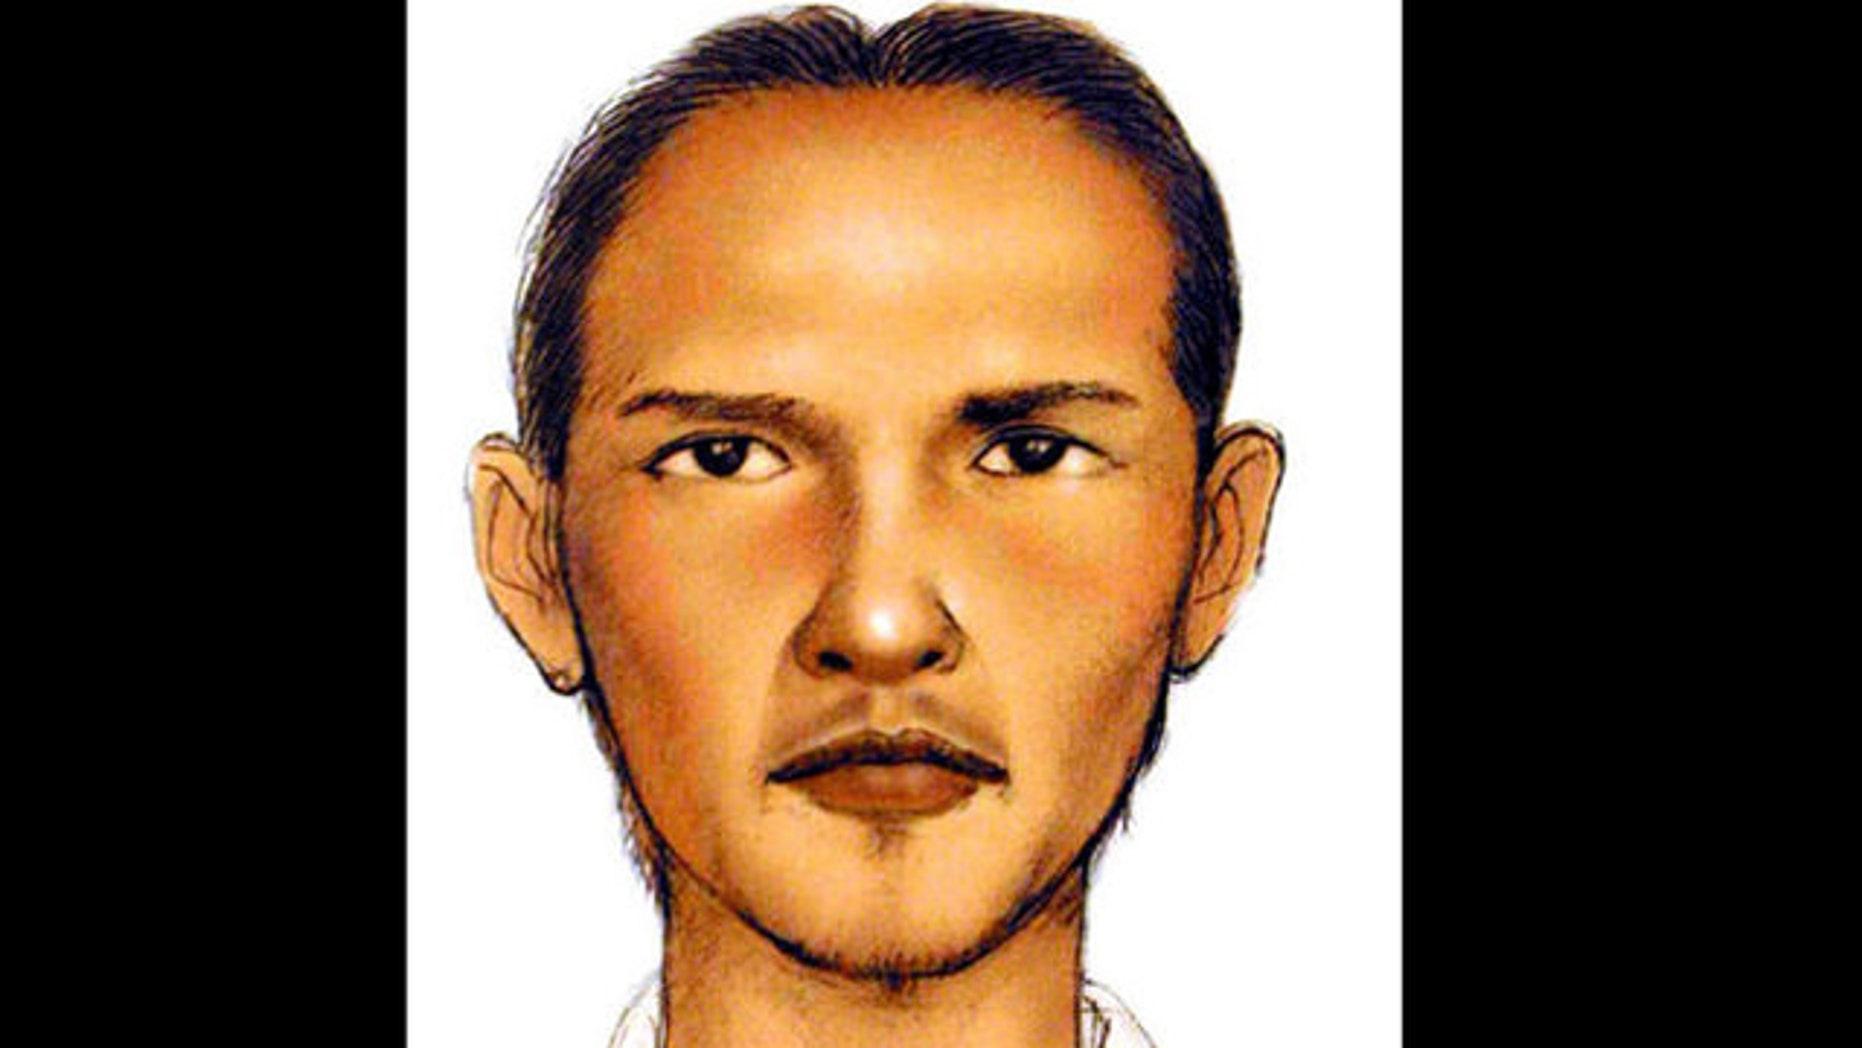 Undated sketch of Bali bombing suspect Umar Patek.